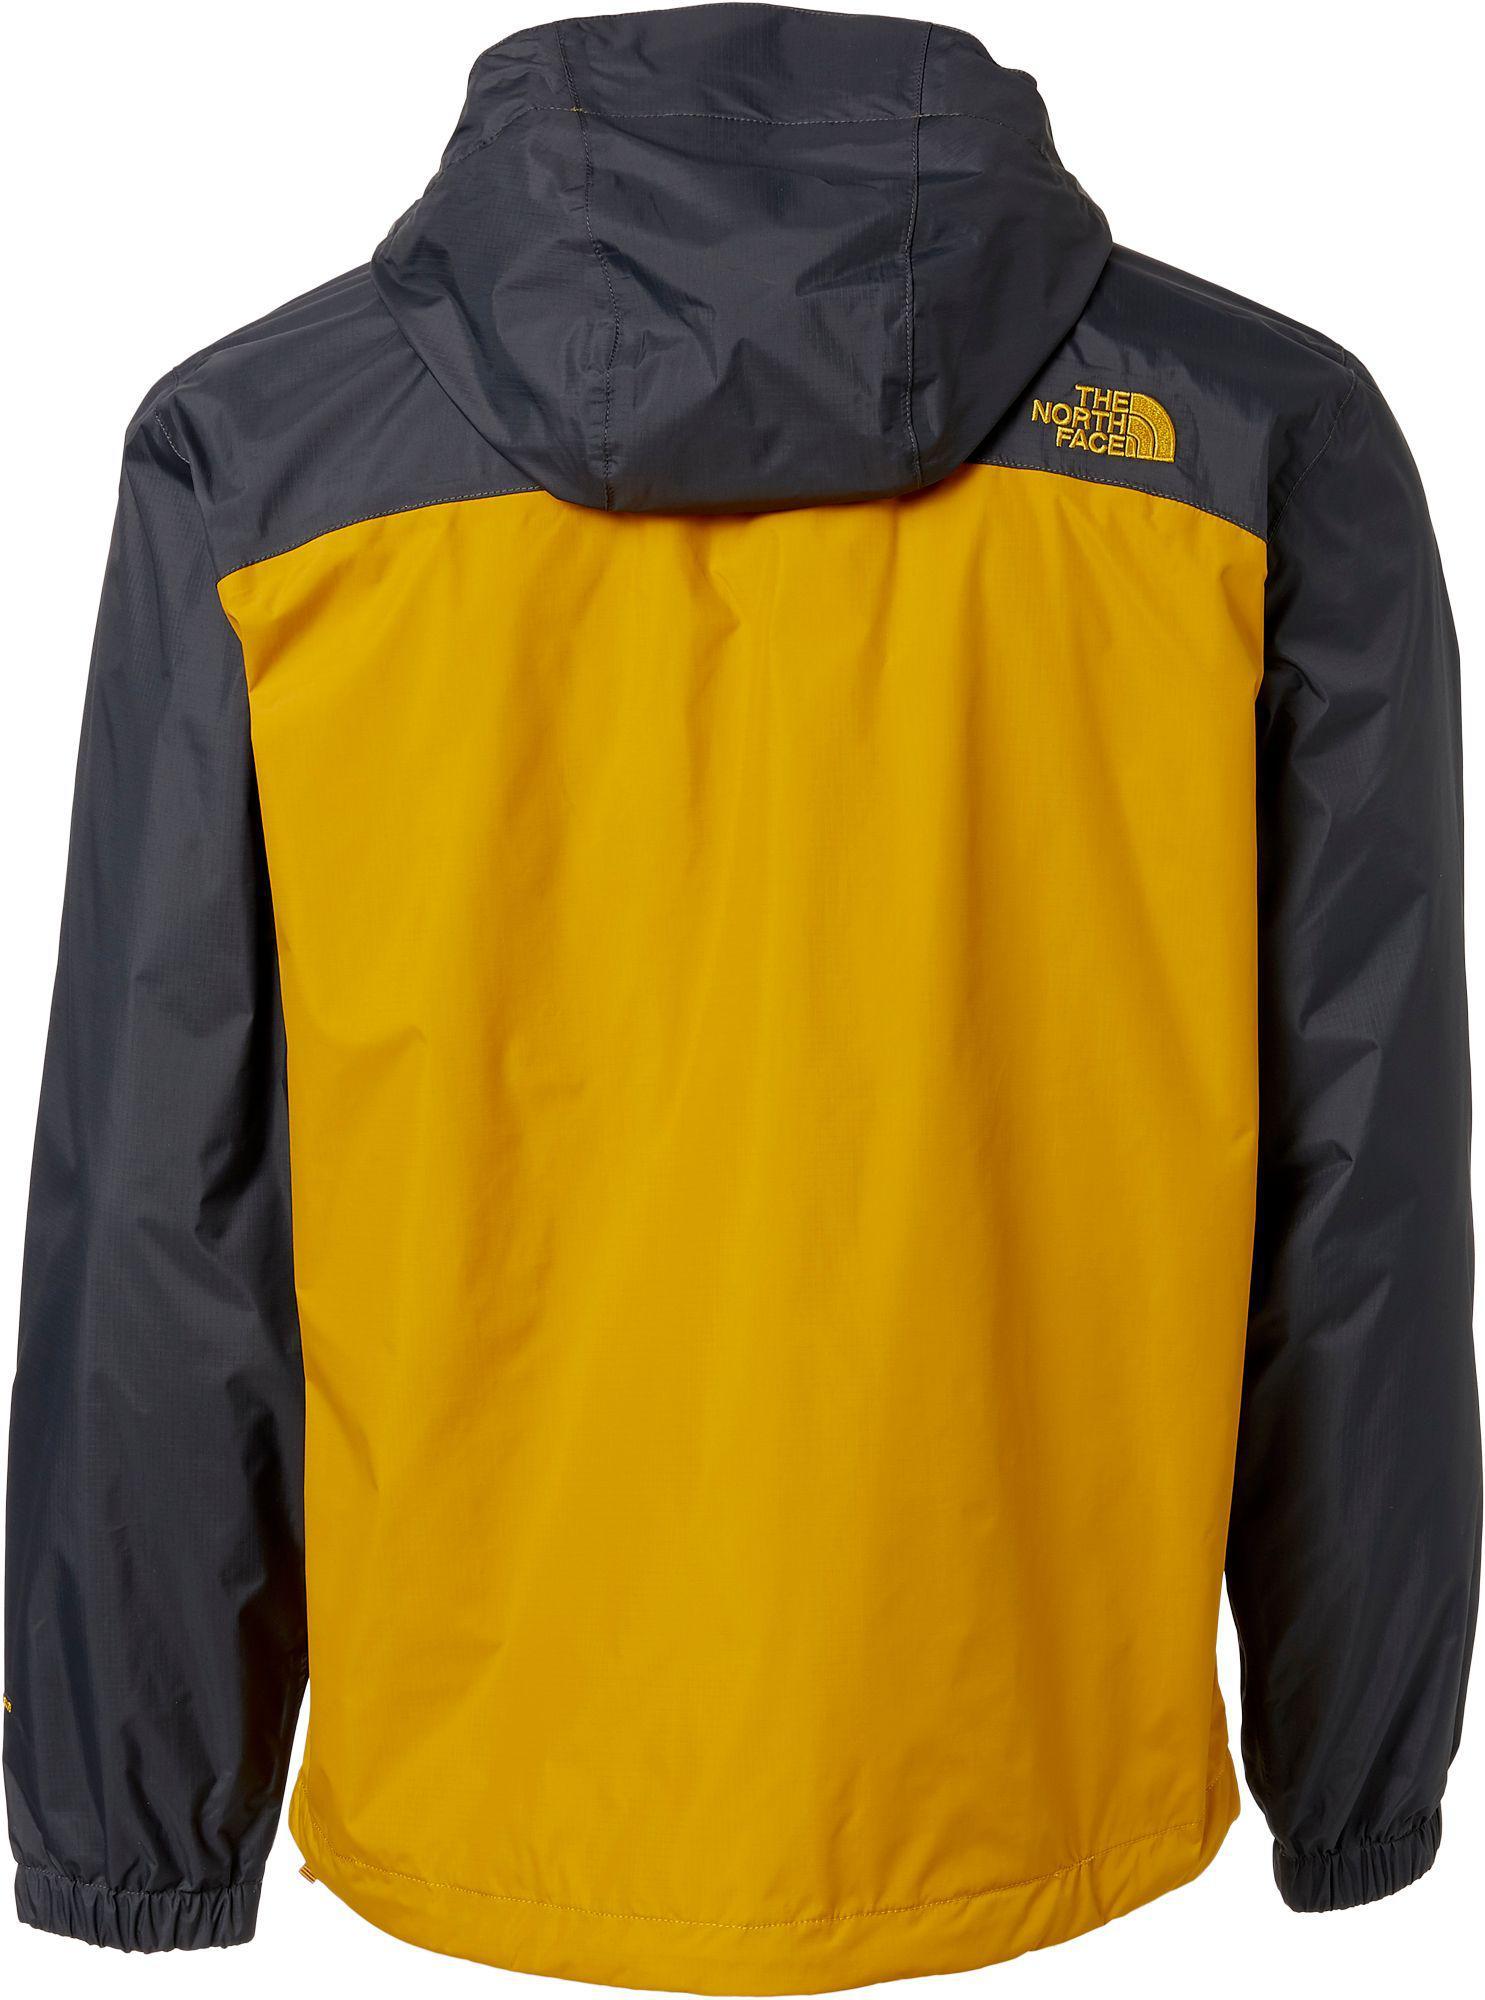 81a95f223b ... denmark the north face yellow stinson rain jacket for men lyst 18131  b0395